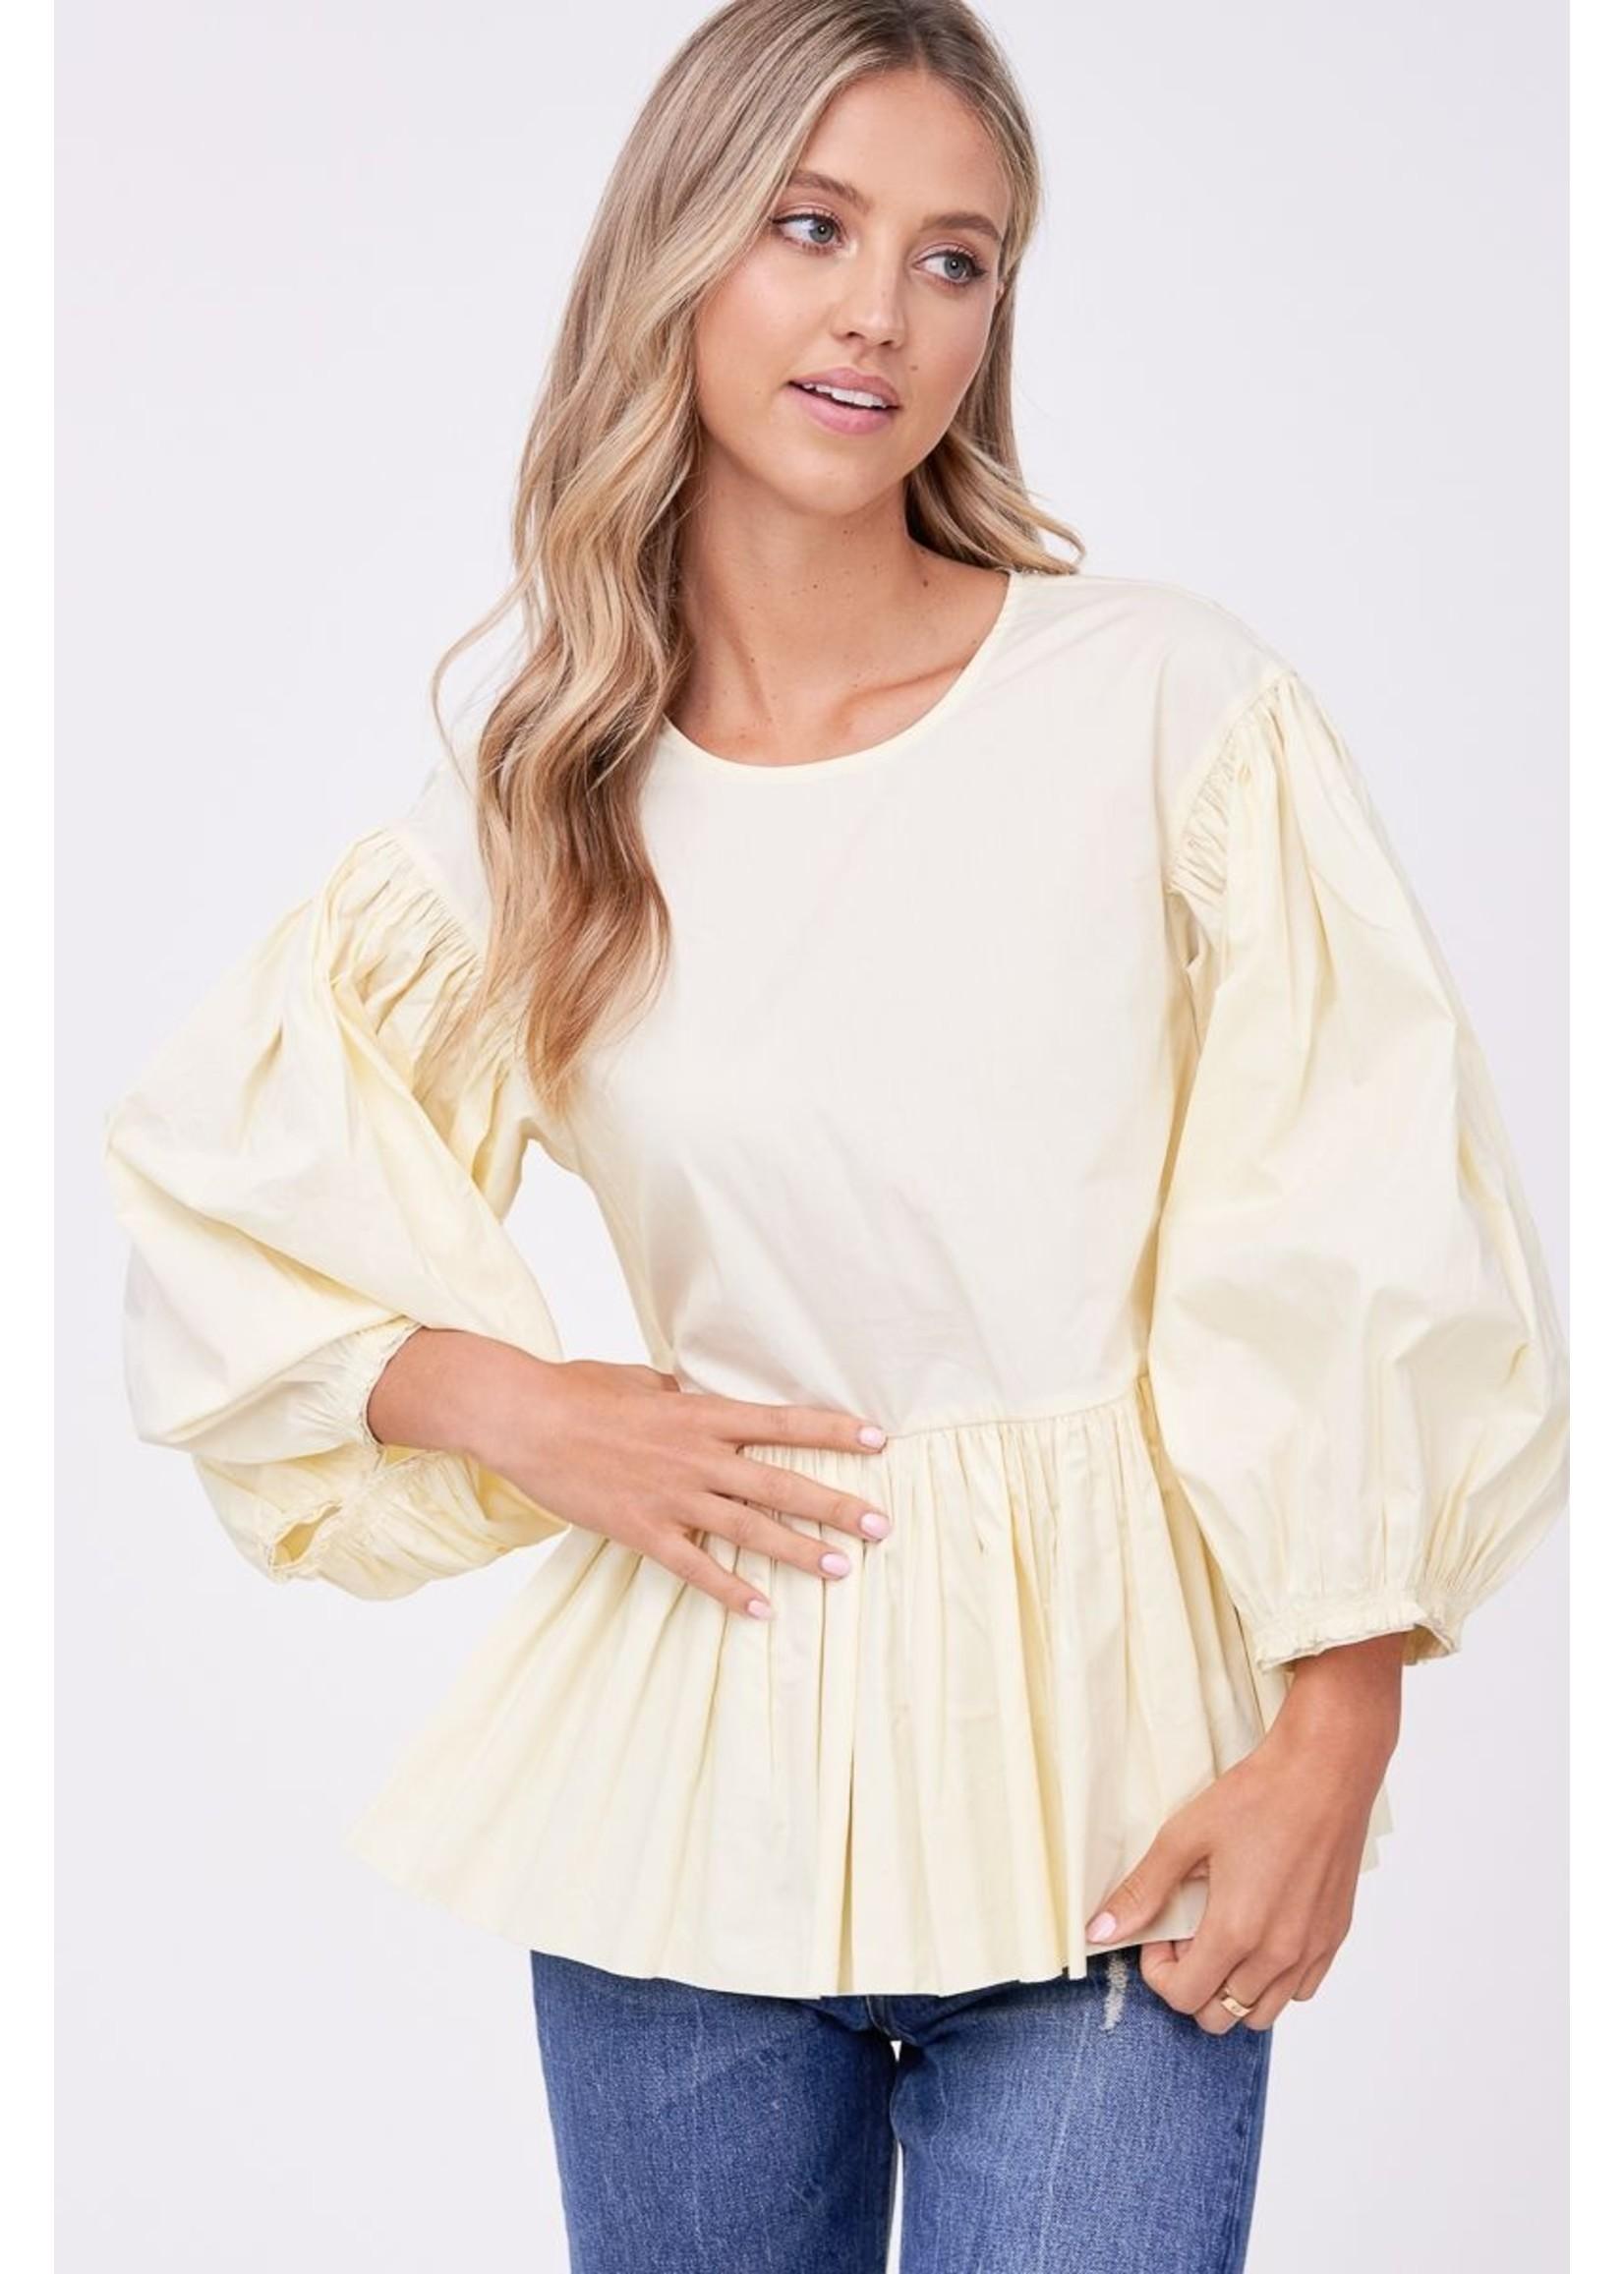 En Saison Poplin Exaggerated Sleeve Blouse - IES1840T